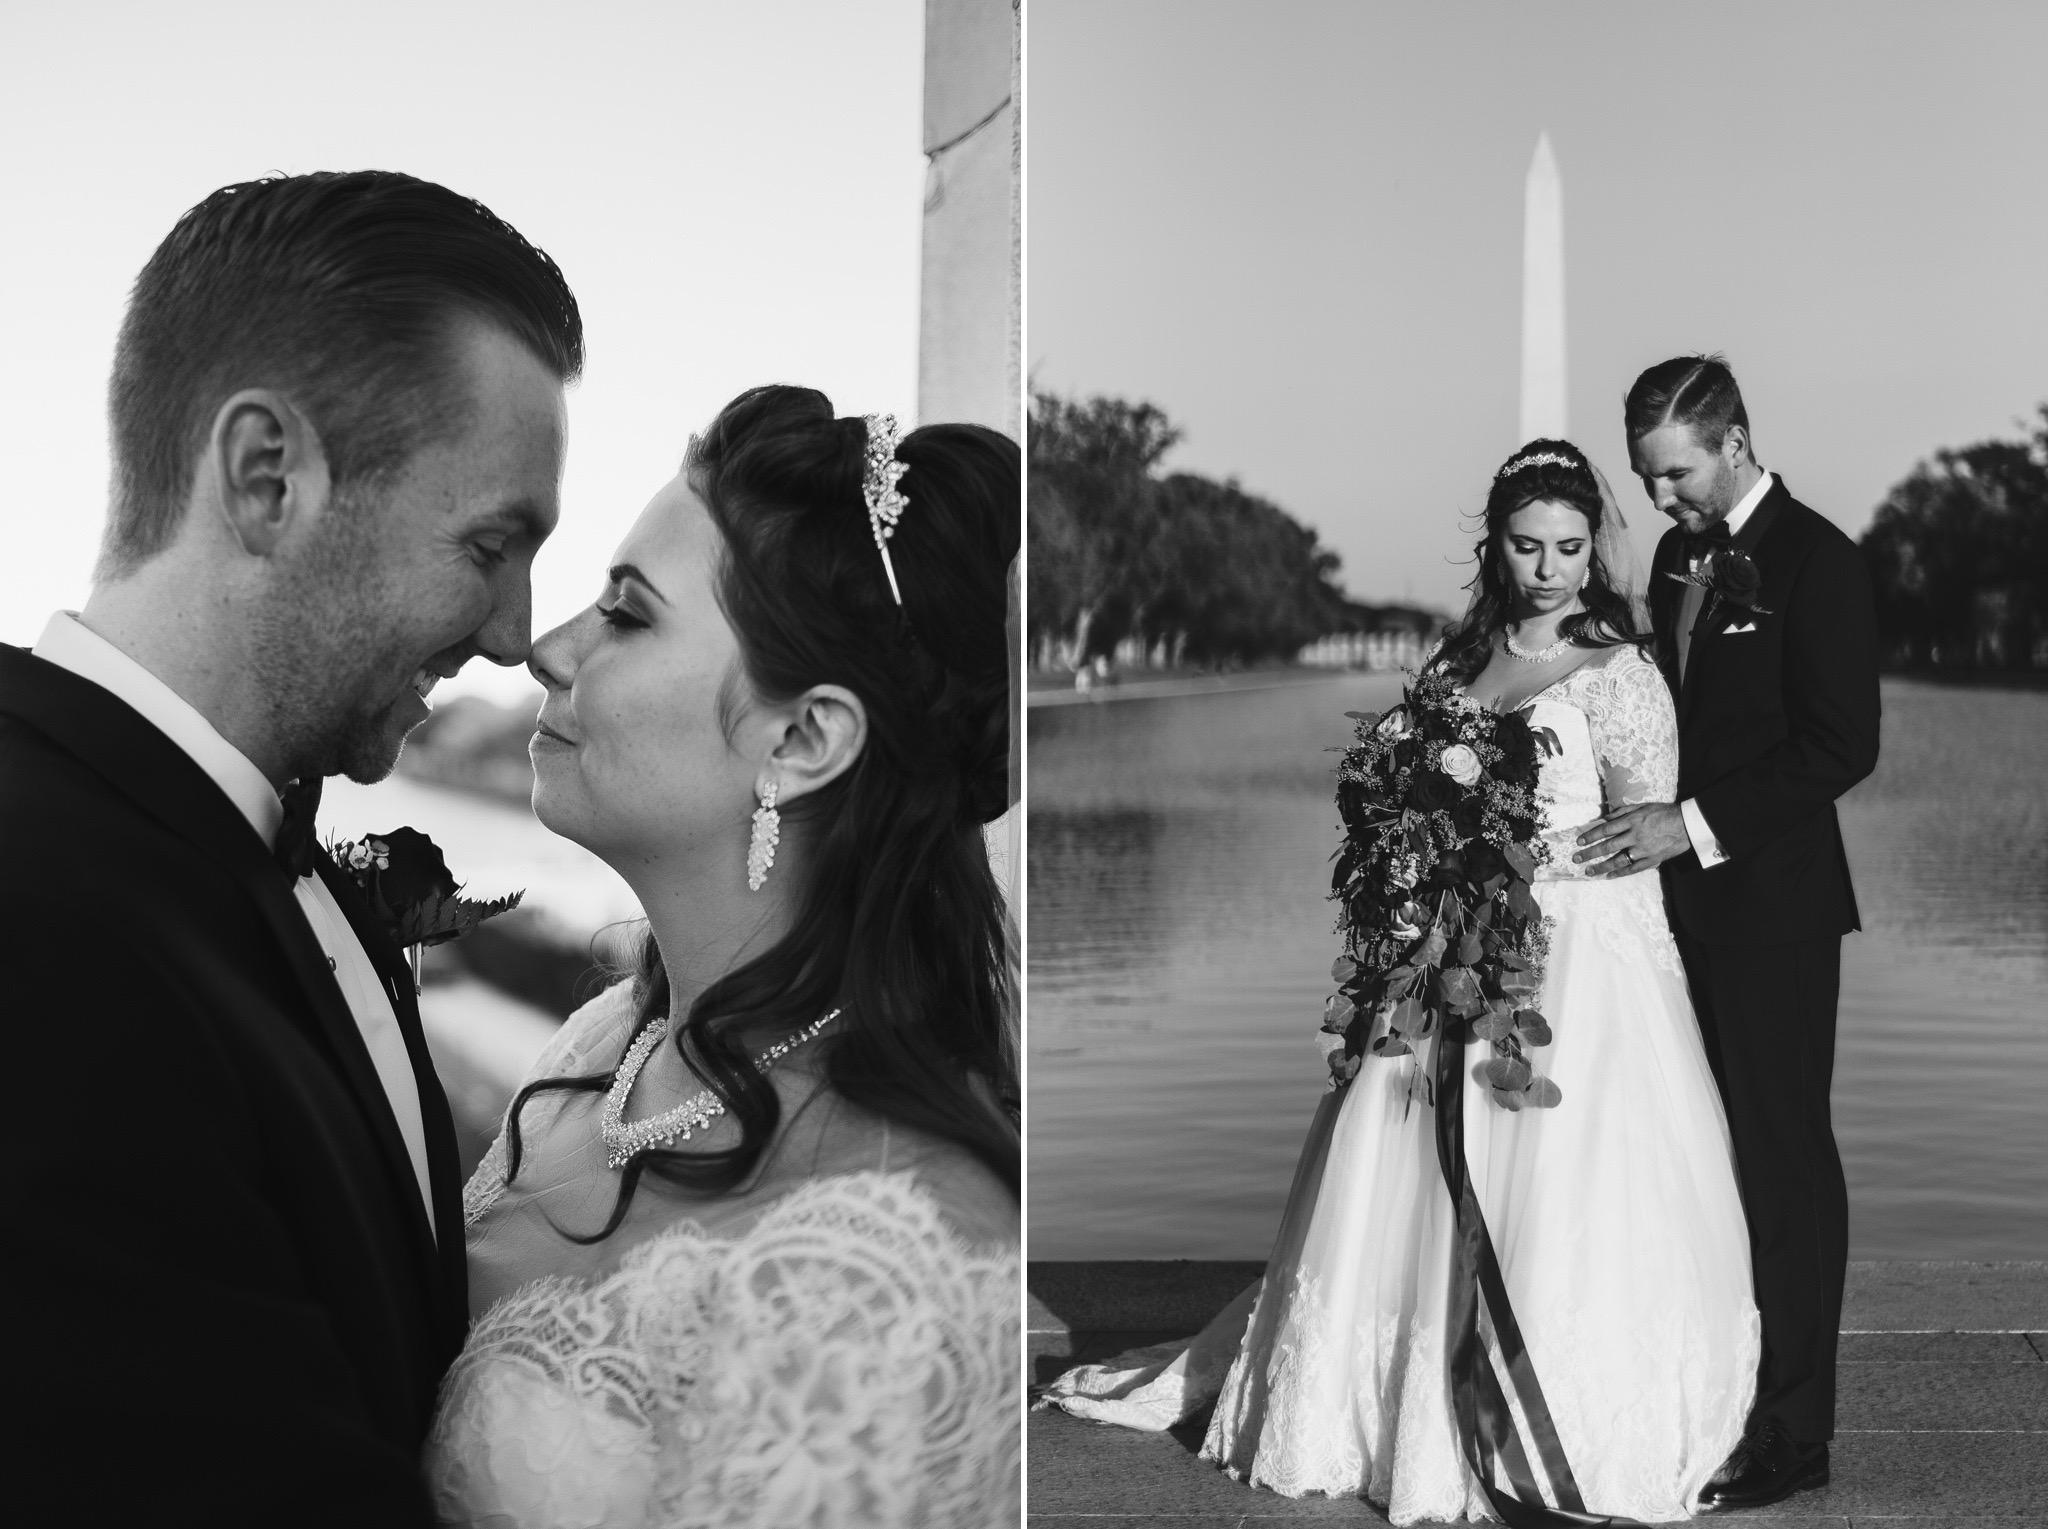 Nathan Elaina Romantic Capitol Wedding in Washington DC by Jonathan Hannah Photography9.jpg